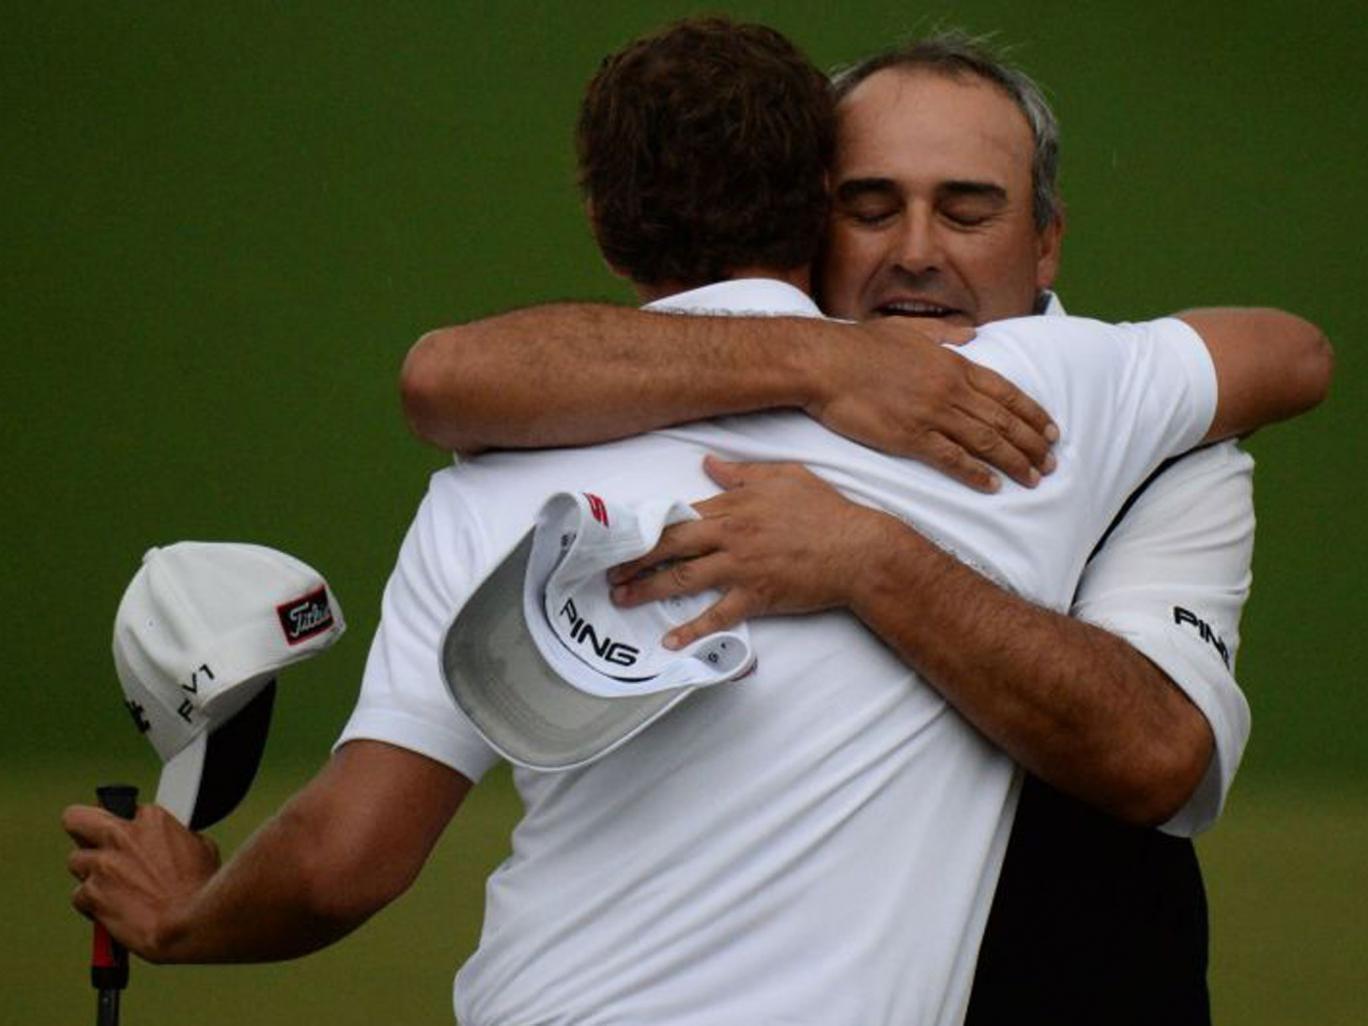 Angel Cabrera congratulates Adam Scott on winning the Masters